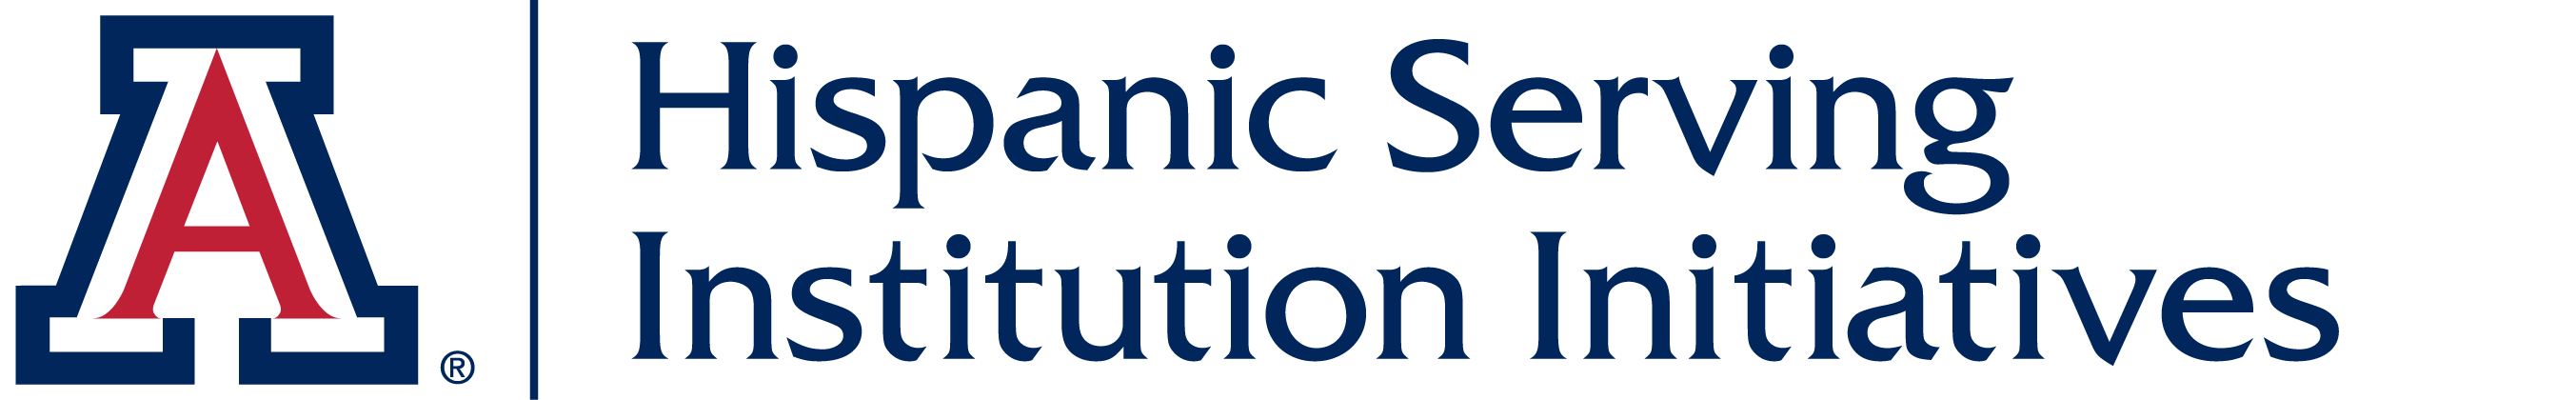 Hispanic Serving Institution (HSI) Initiatives | Home